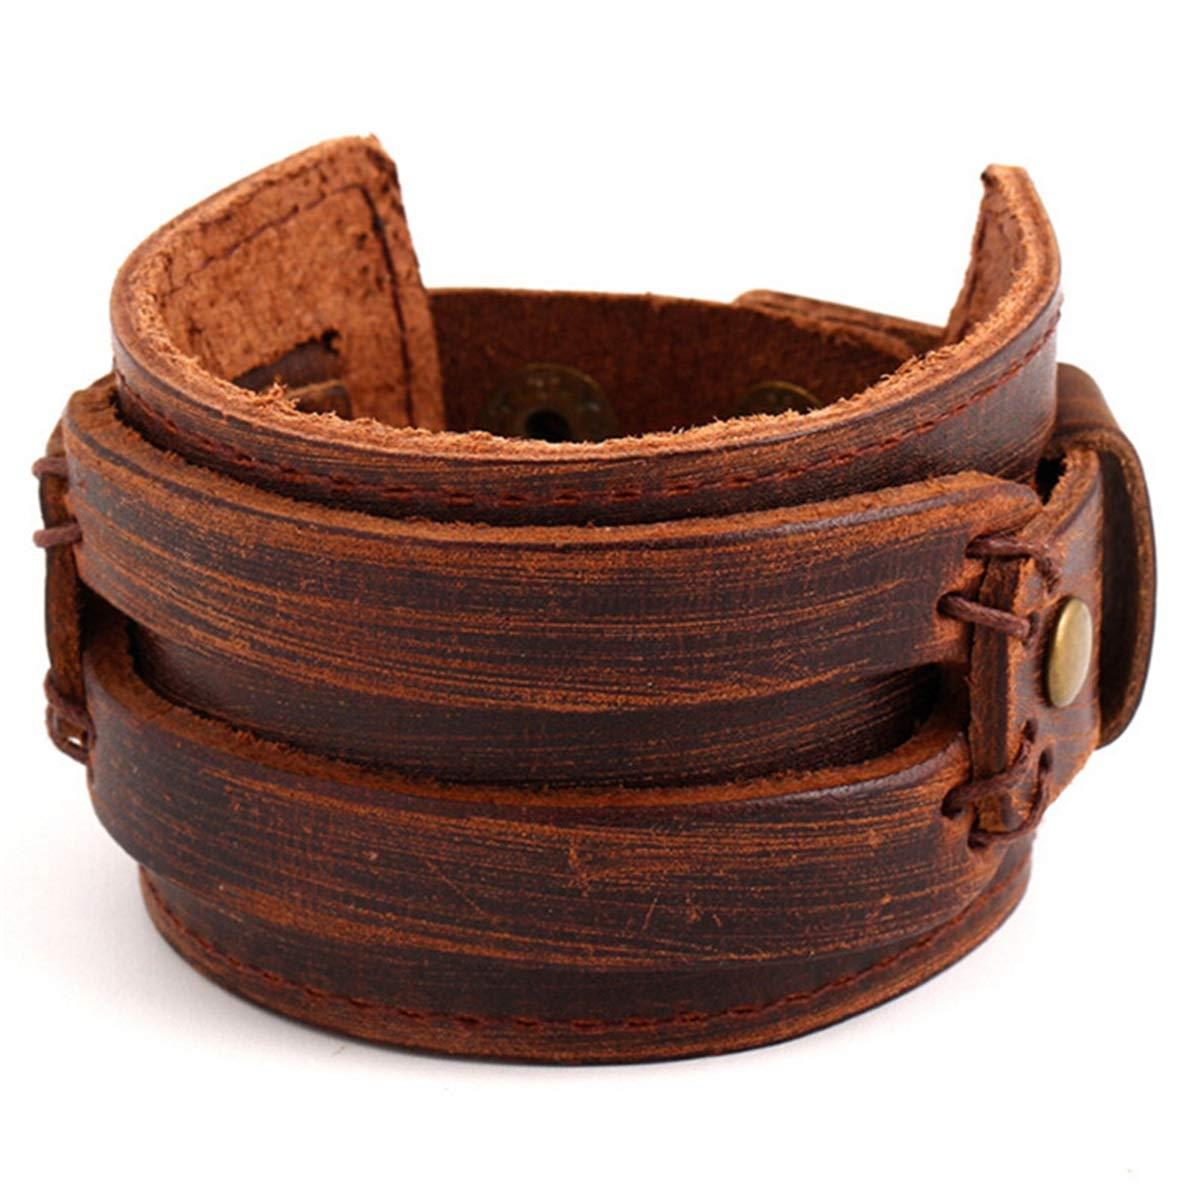 BNNNEA Cuff Bracelets /& Bangles Wristband Retro Male Jewelry Wholesale Handmade Brown Vintage Braclet Men Wide Leather Wrap